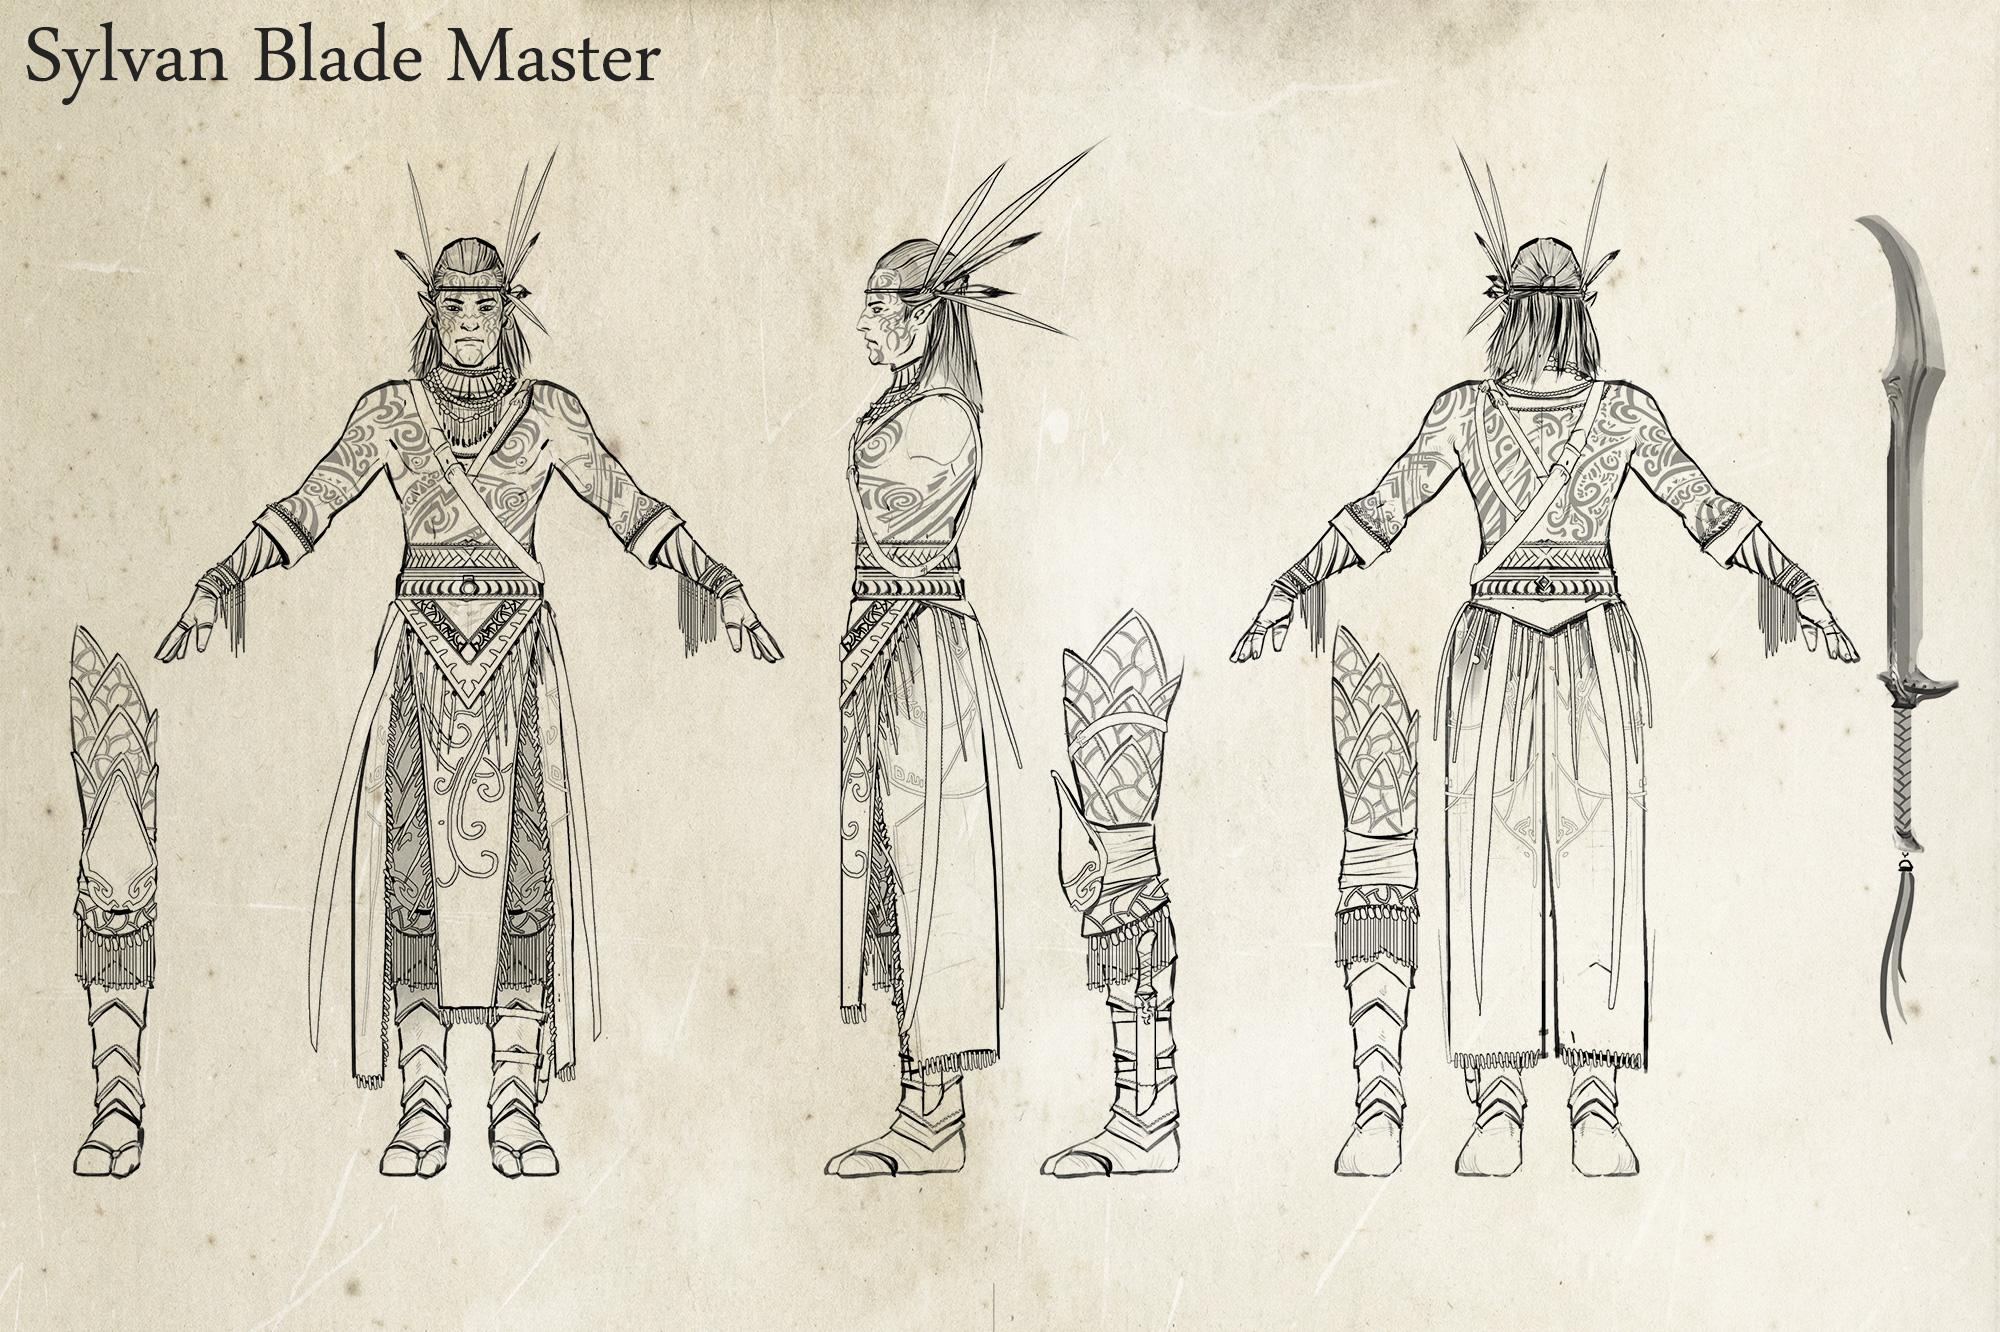 https://ubistatic-a.akamaihd.net/0004/prod/images/150624_Sylvan_2/MMH7_Blade_Master_T.jpg